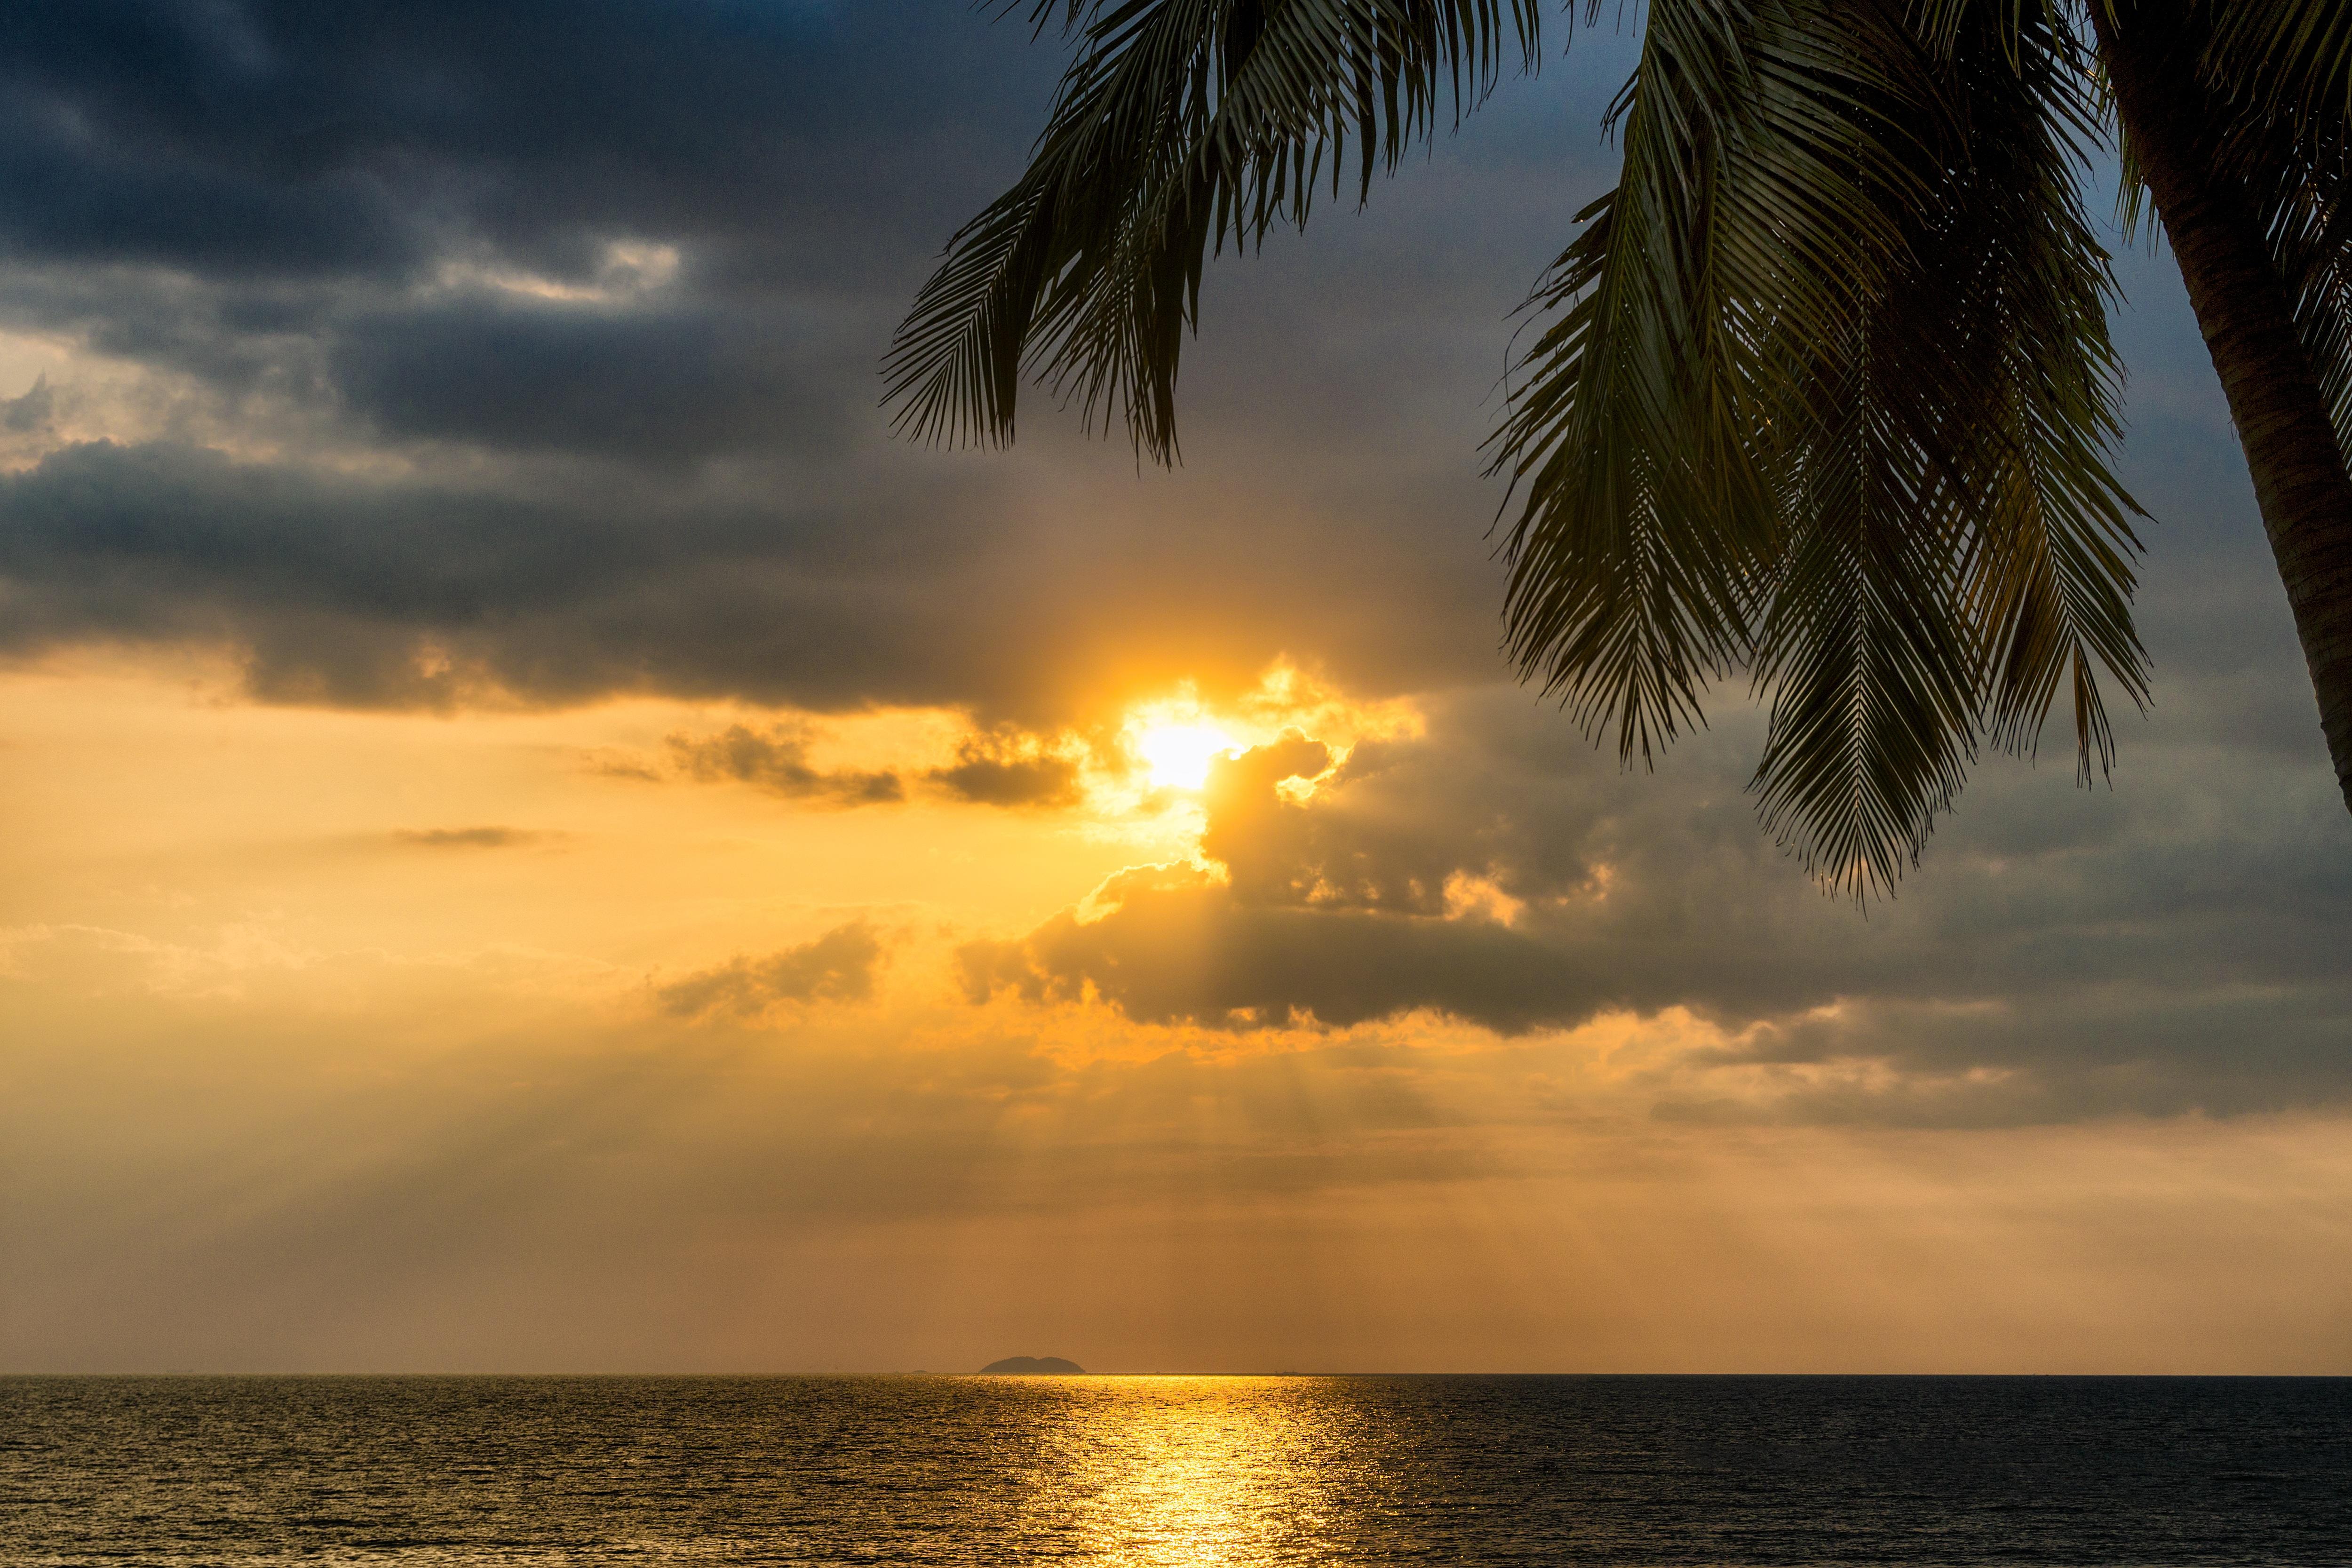 Tropics Palm Trees Sun Beach 4k Hd Desktop Wallpaper For: 1920x1080 Tropical Palm Tree Beside Sunset Ocean 5k Laptop